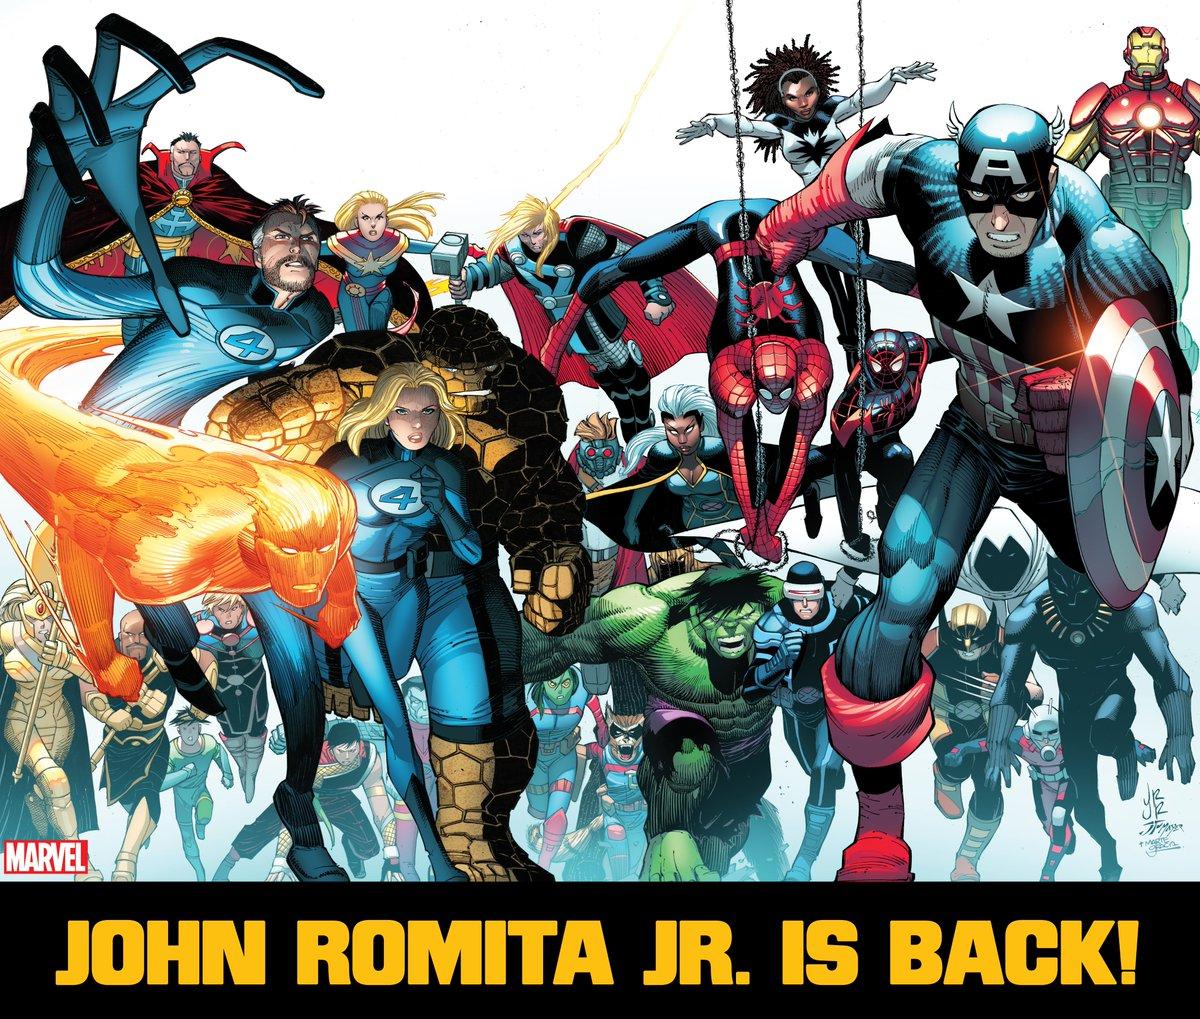 john romita jr vuelve a marvel comics